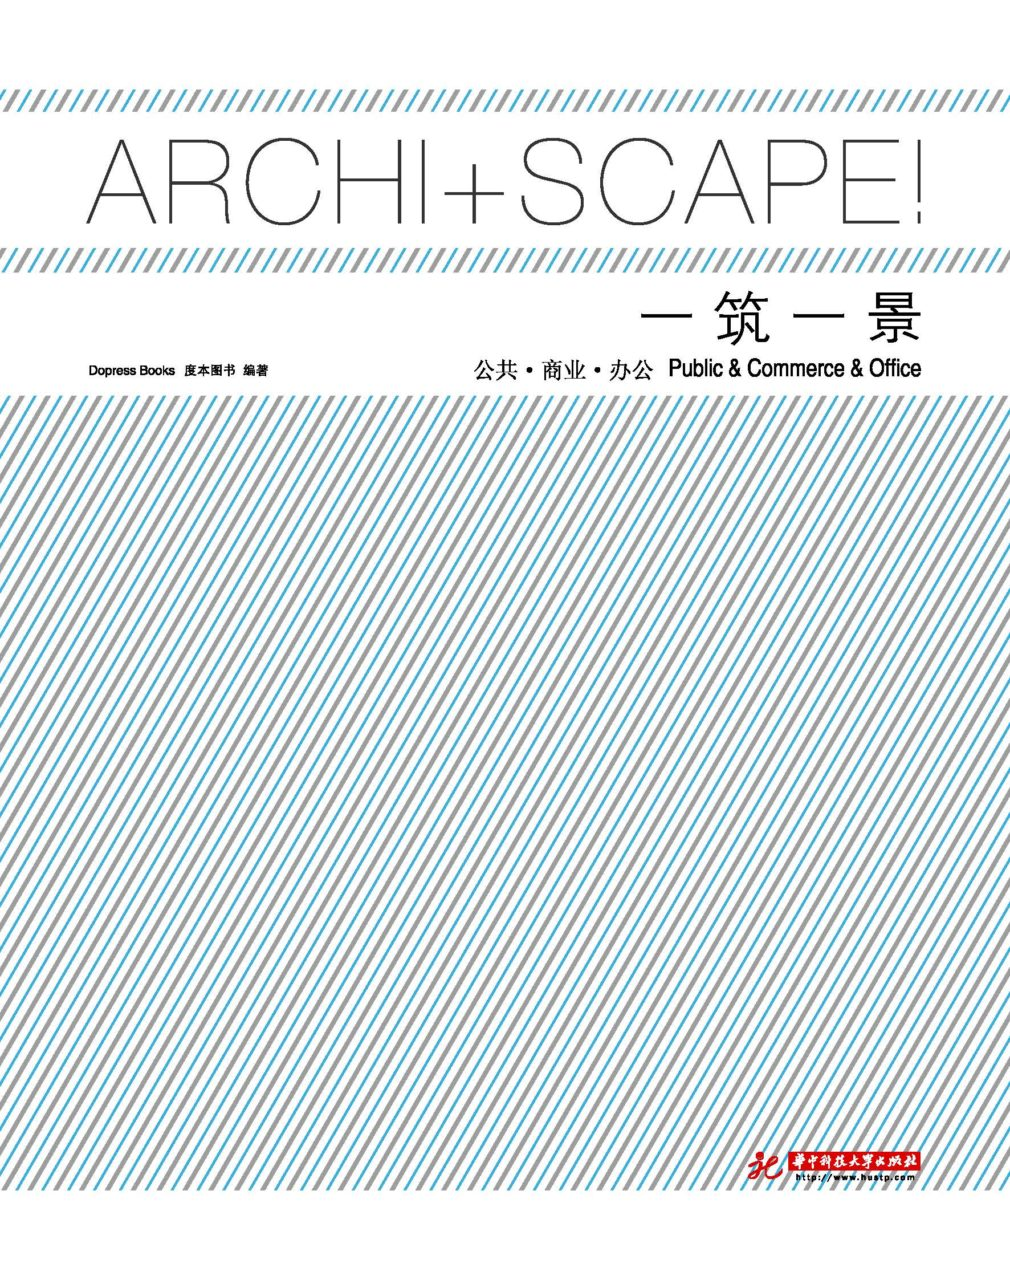 http://www.saota.com/wp-content/uploads/2018/01/ARCHISCAPEPublicCommerceOffice_SAOTA_Page_1.jpg